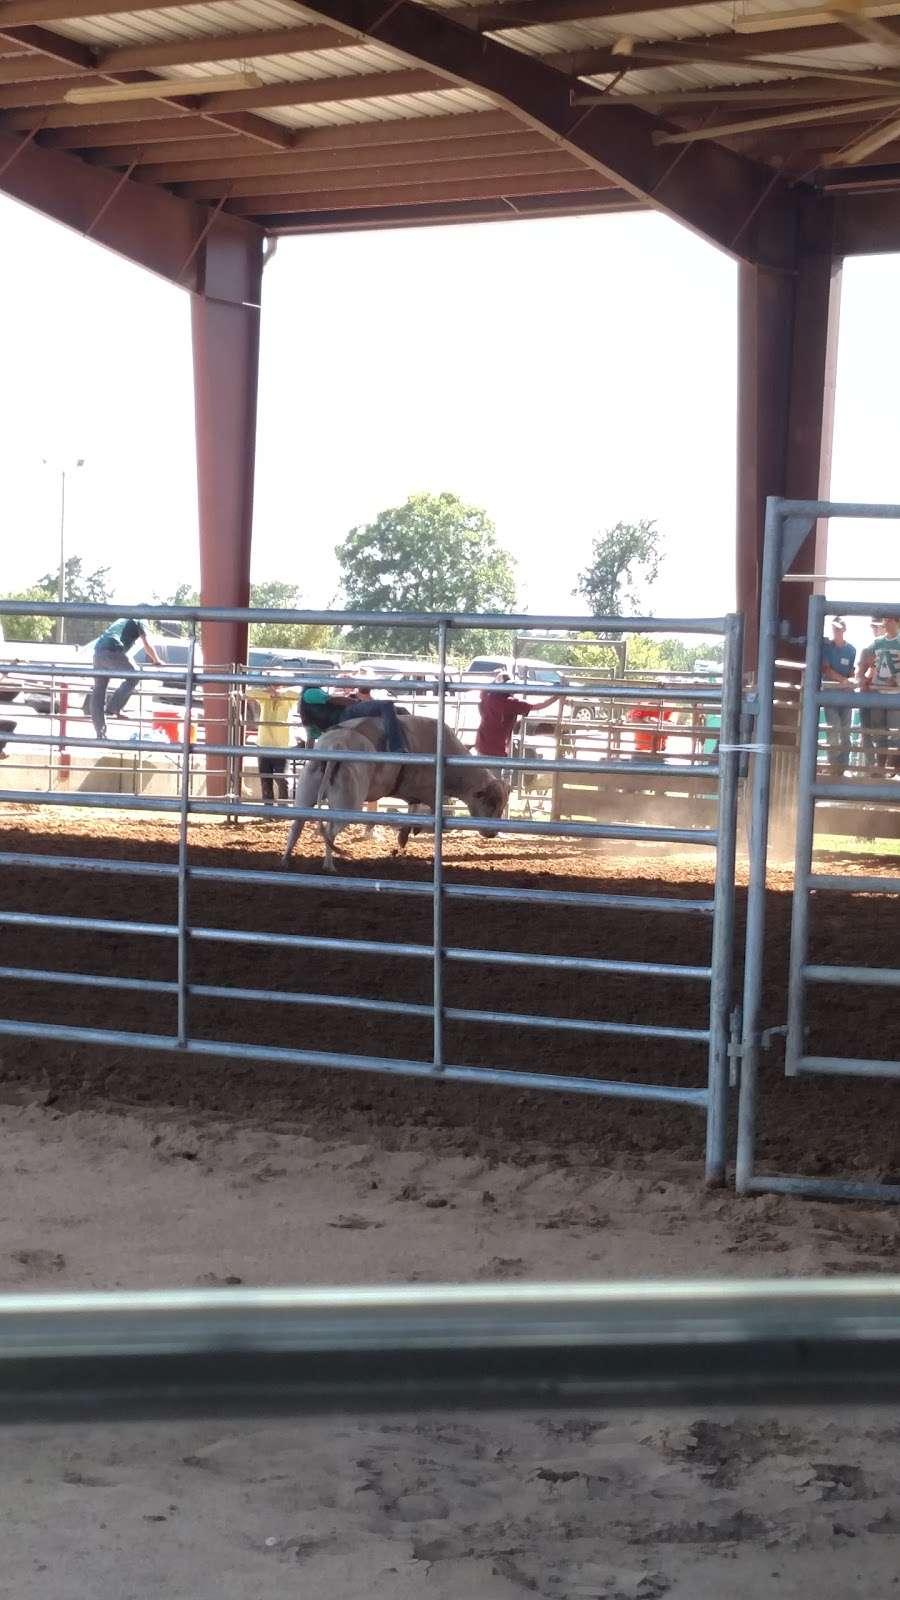 Lone Star Cowboy Church - church  | Photo 8 of 10 | Address: 21627 Eva St, Montgomery, TX 77356, USA | Phone: (936) 597-5742